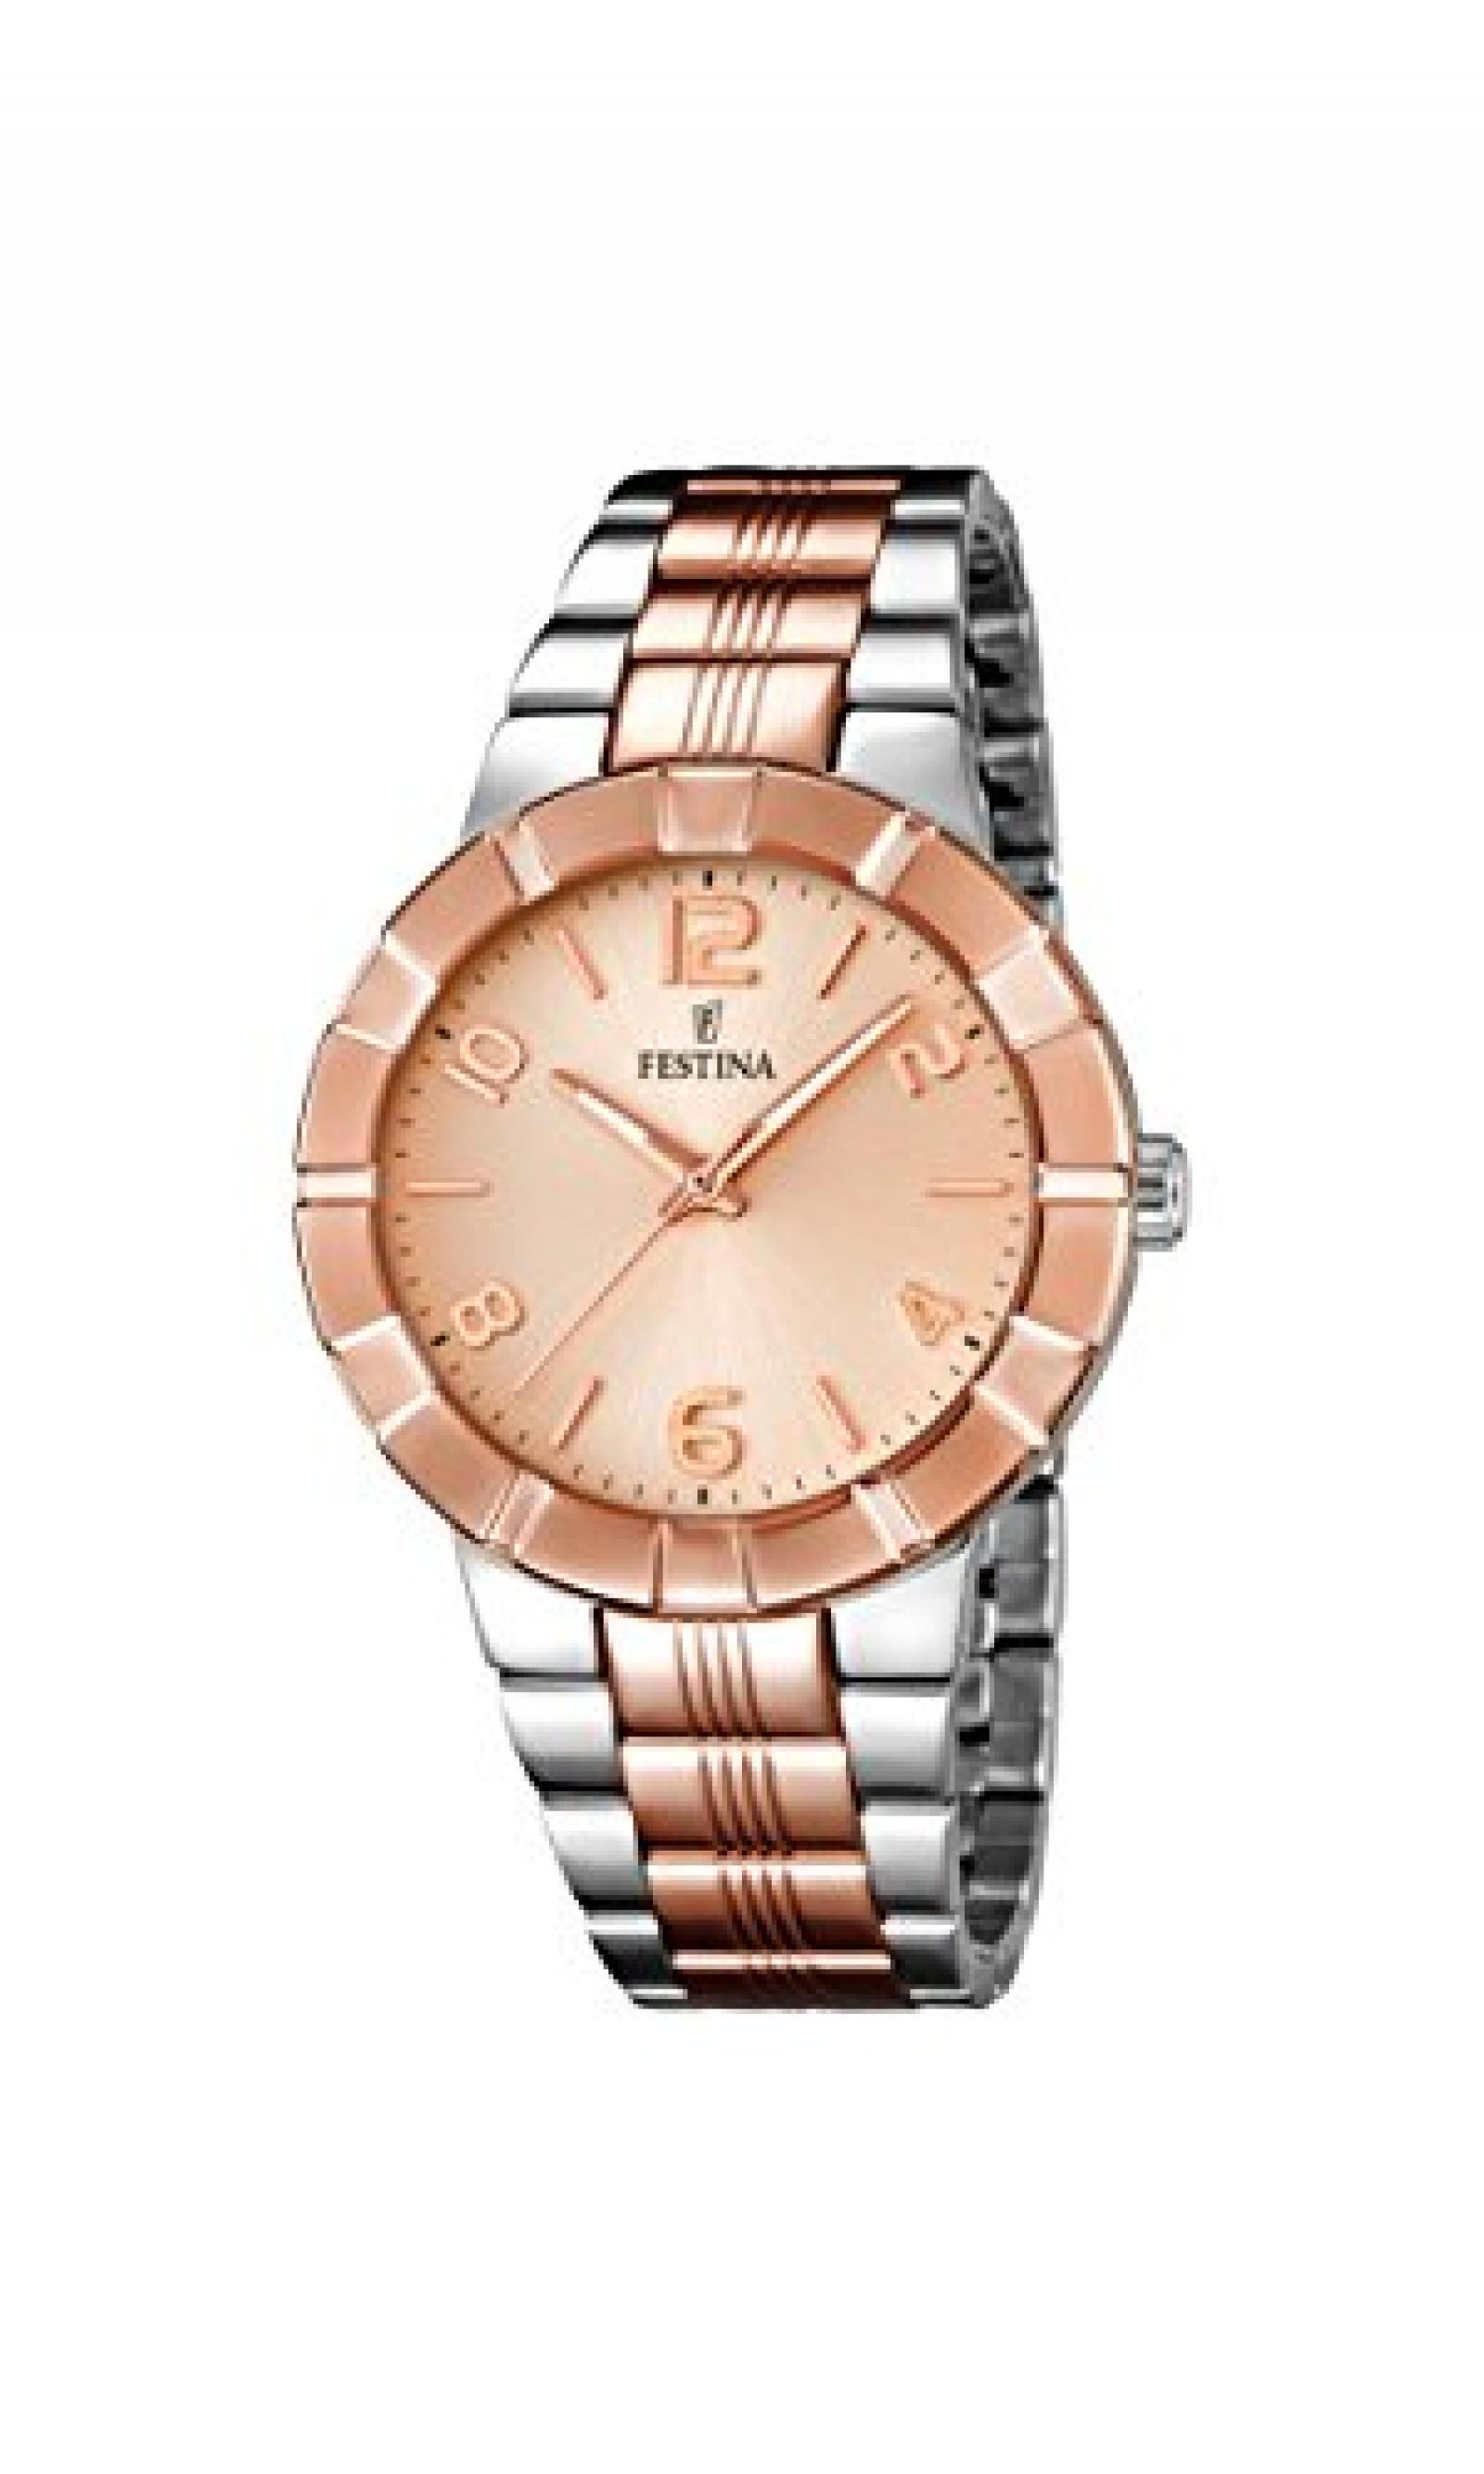 Festina Damen-Armbanduhr Analog Quarz Edelstahl F16712/2